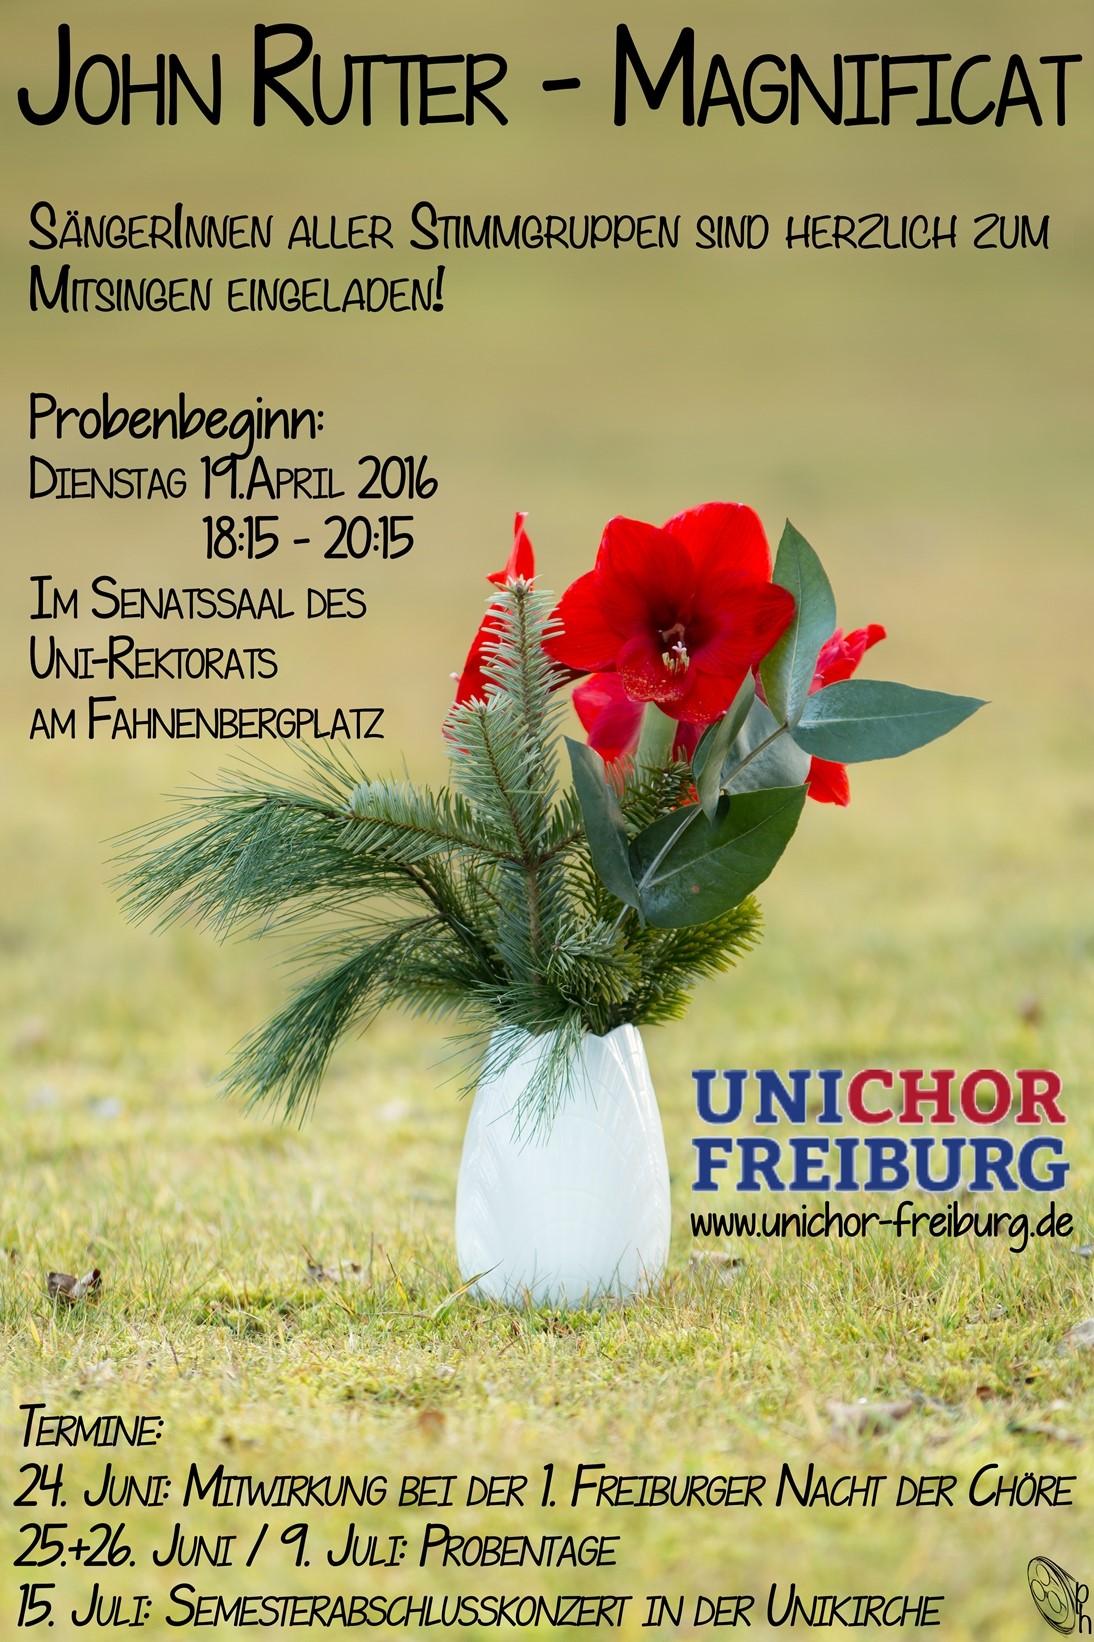 Unichor Freiburg